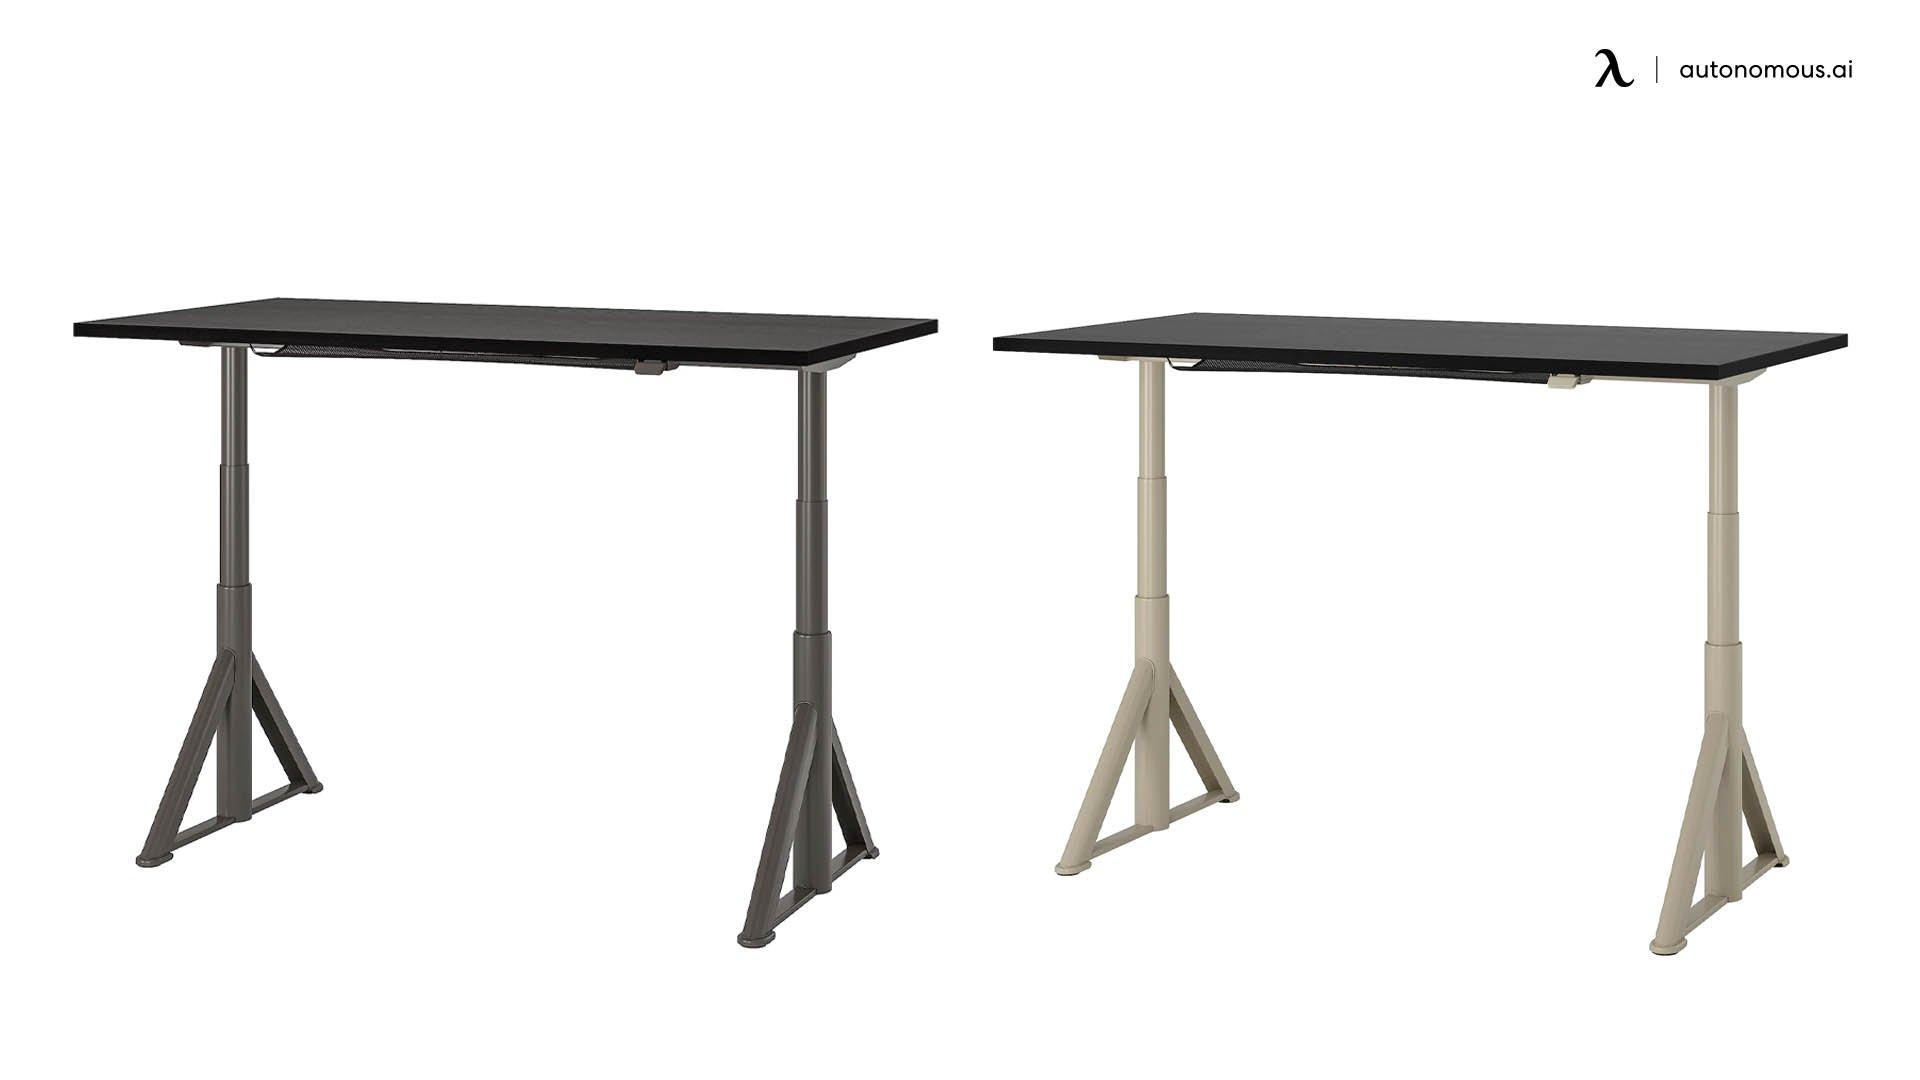 Idasen DIY Underframe Kit from IKEA